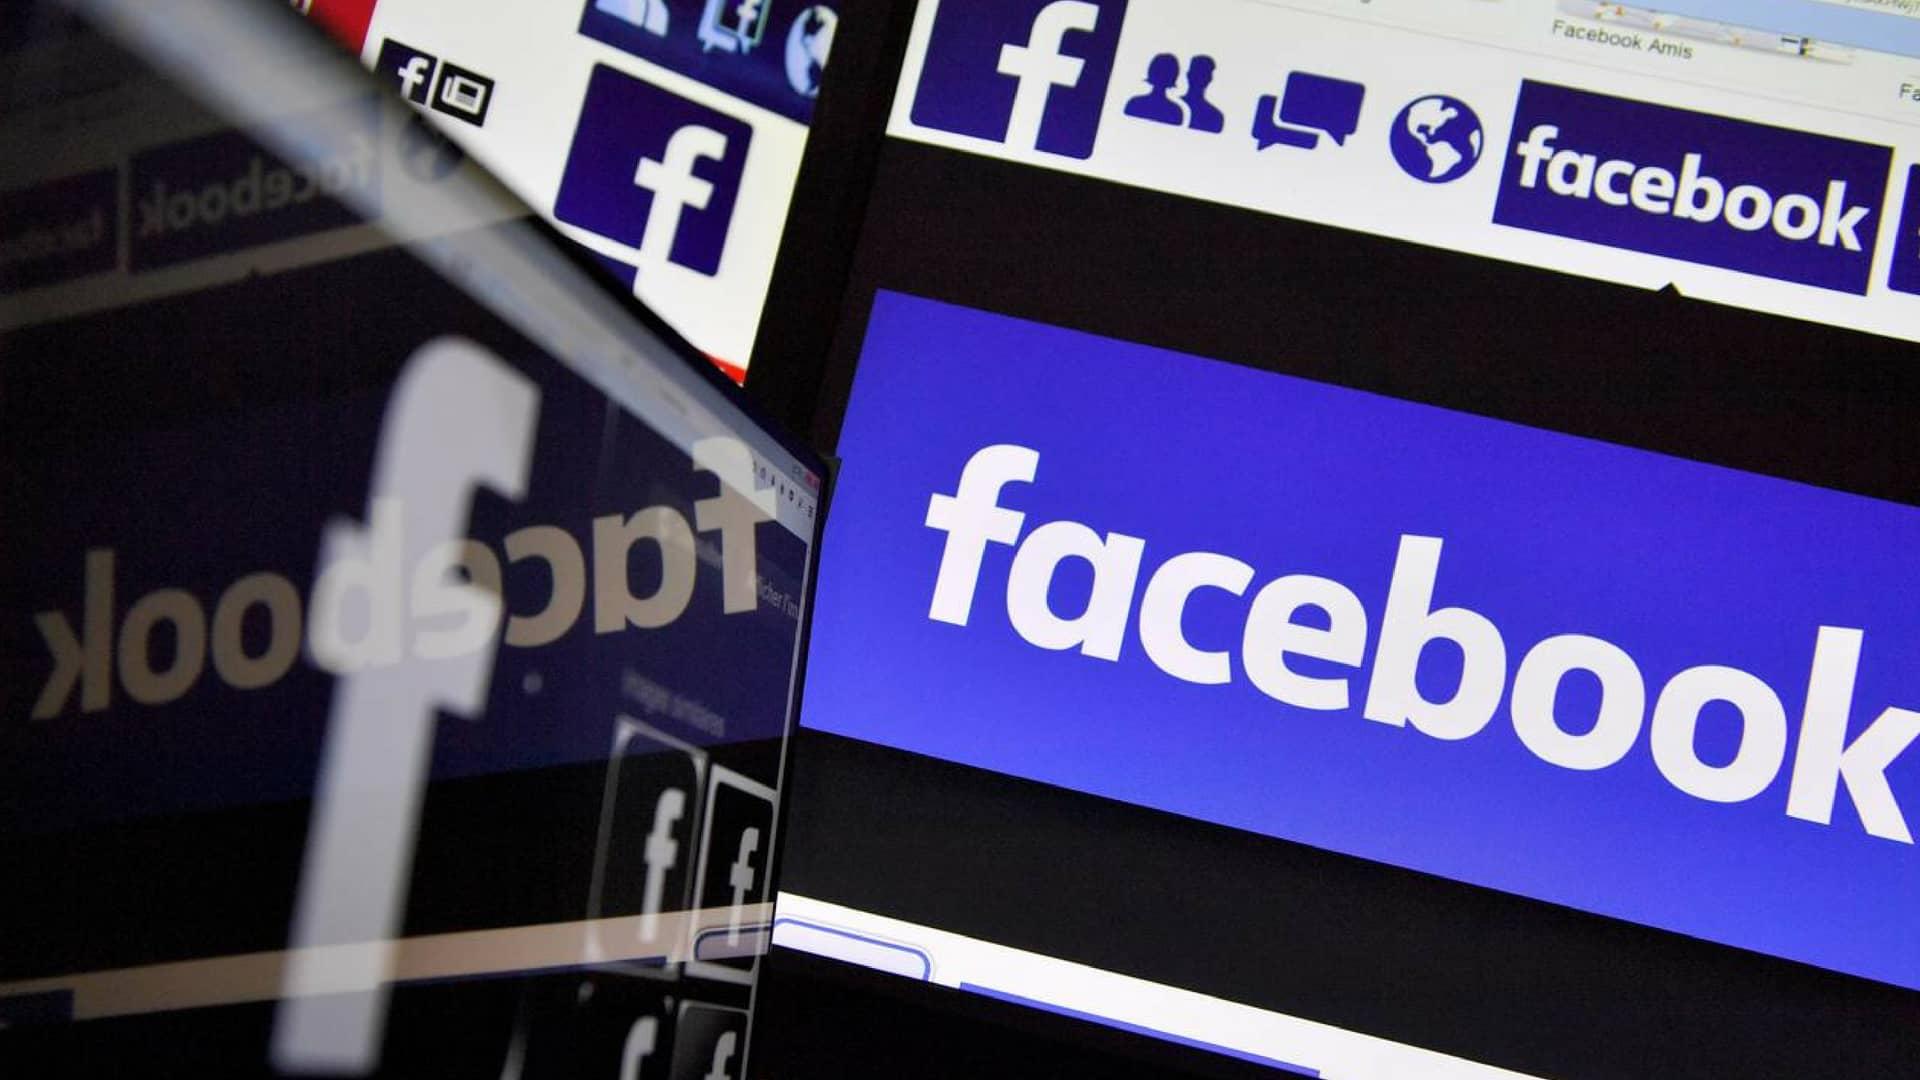 unicredit-rompe-facebook